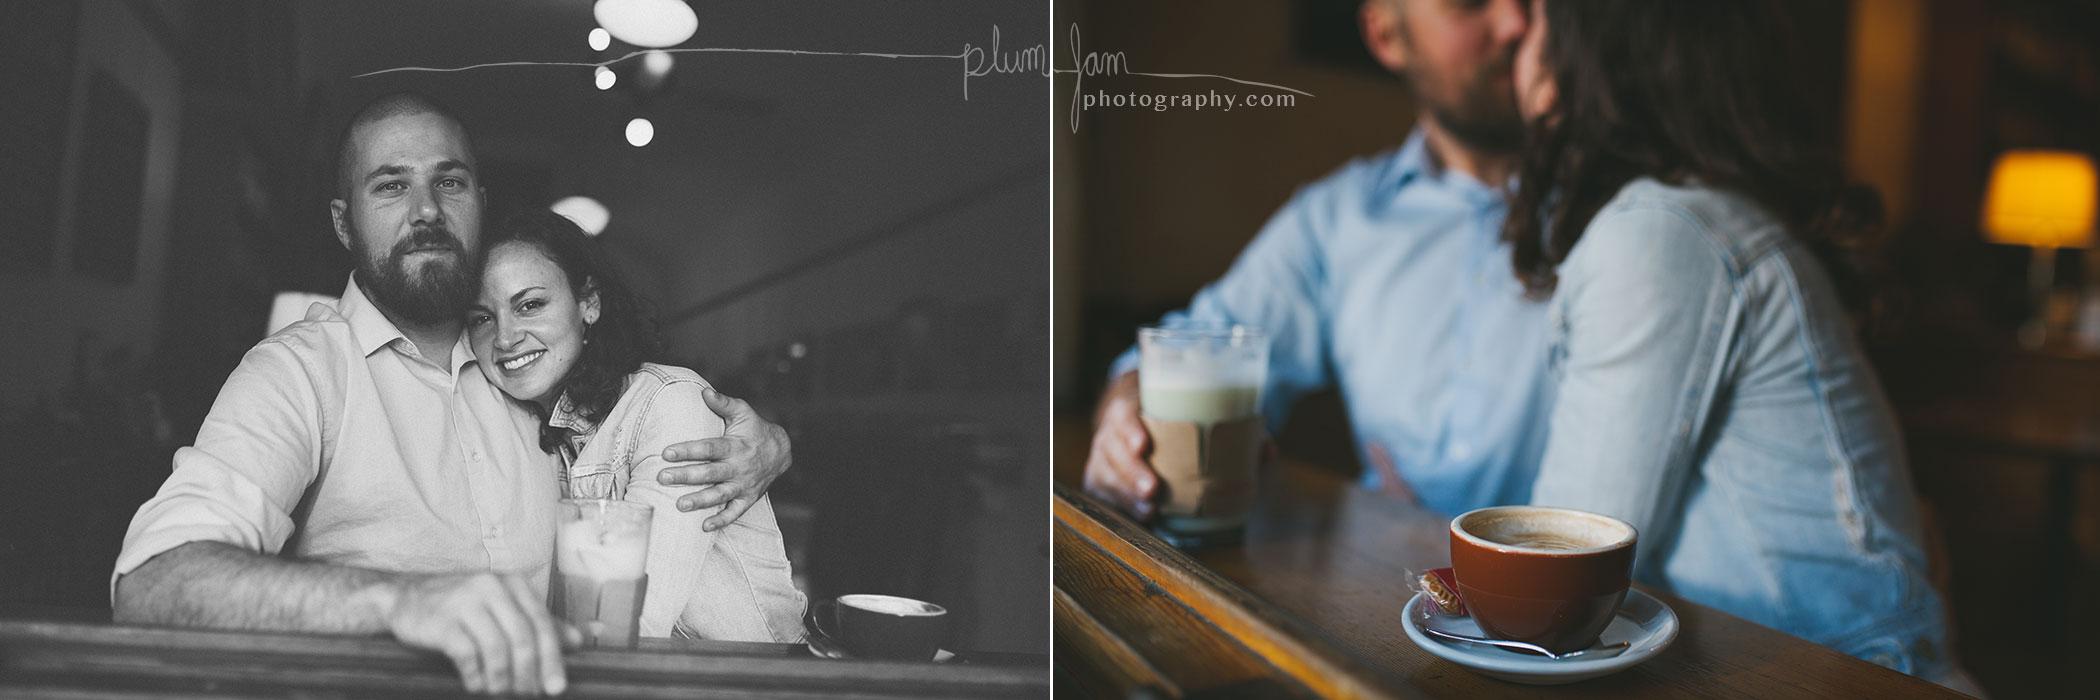 JanCraig03_PlumJamPhotography